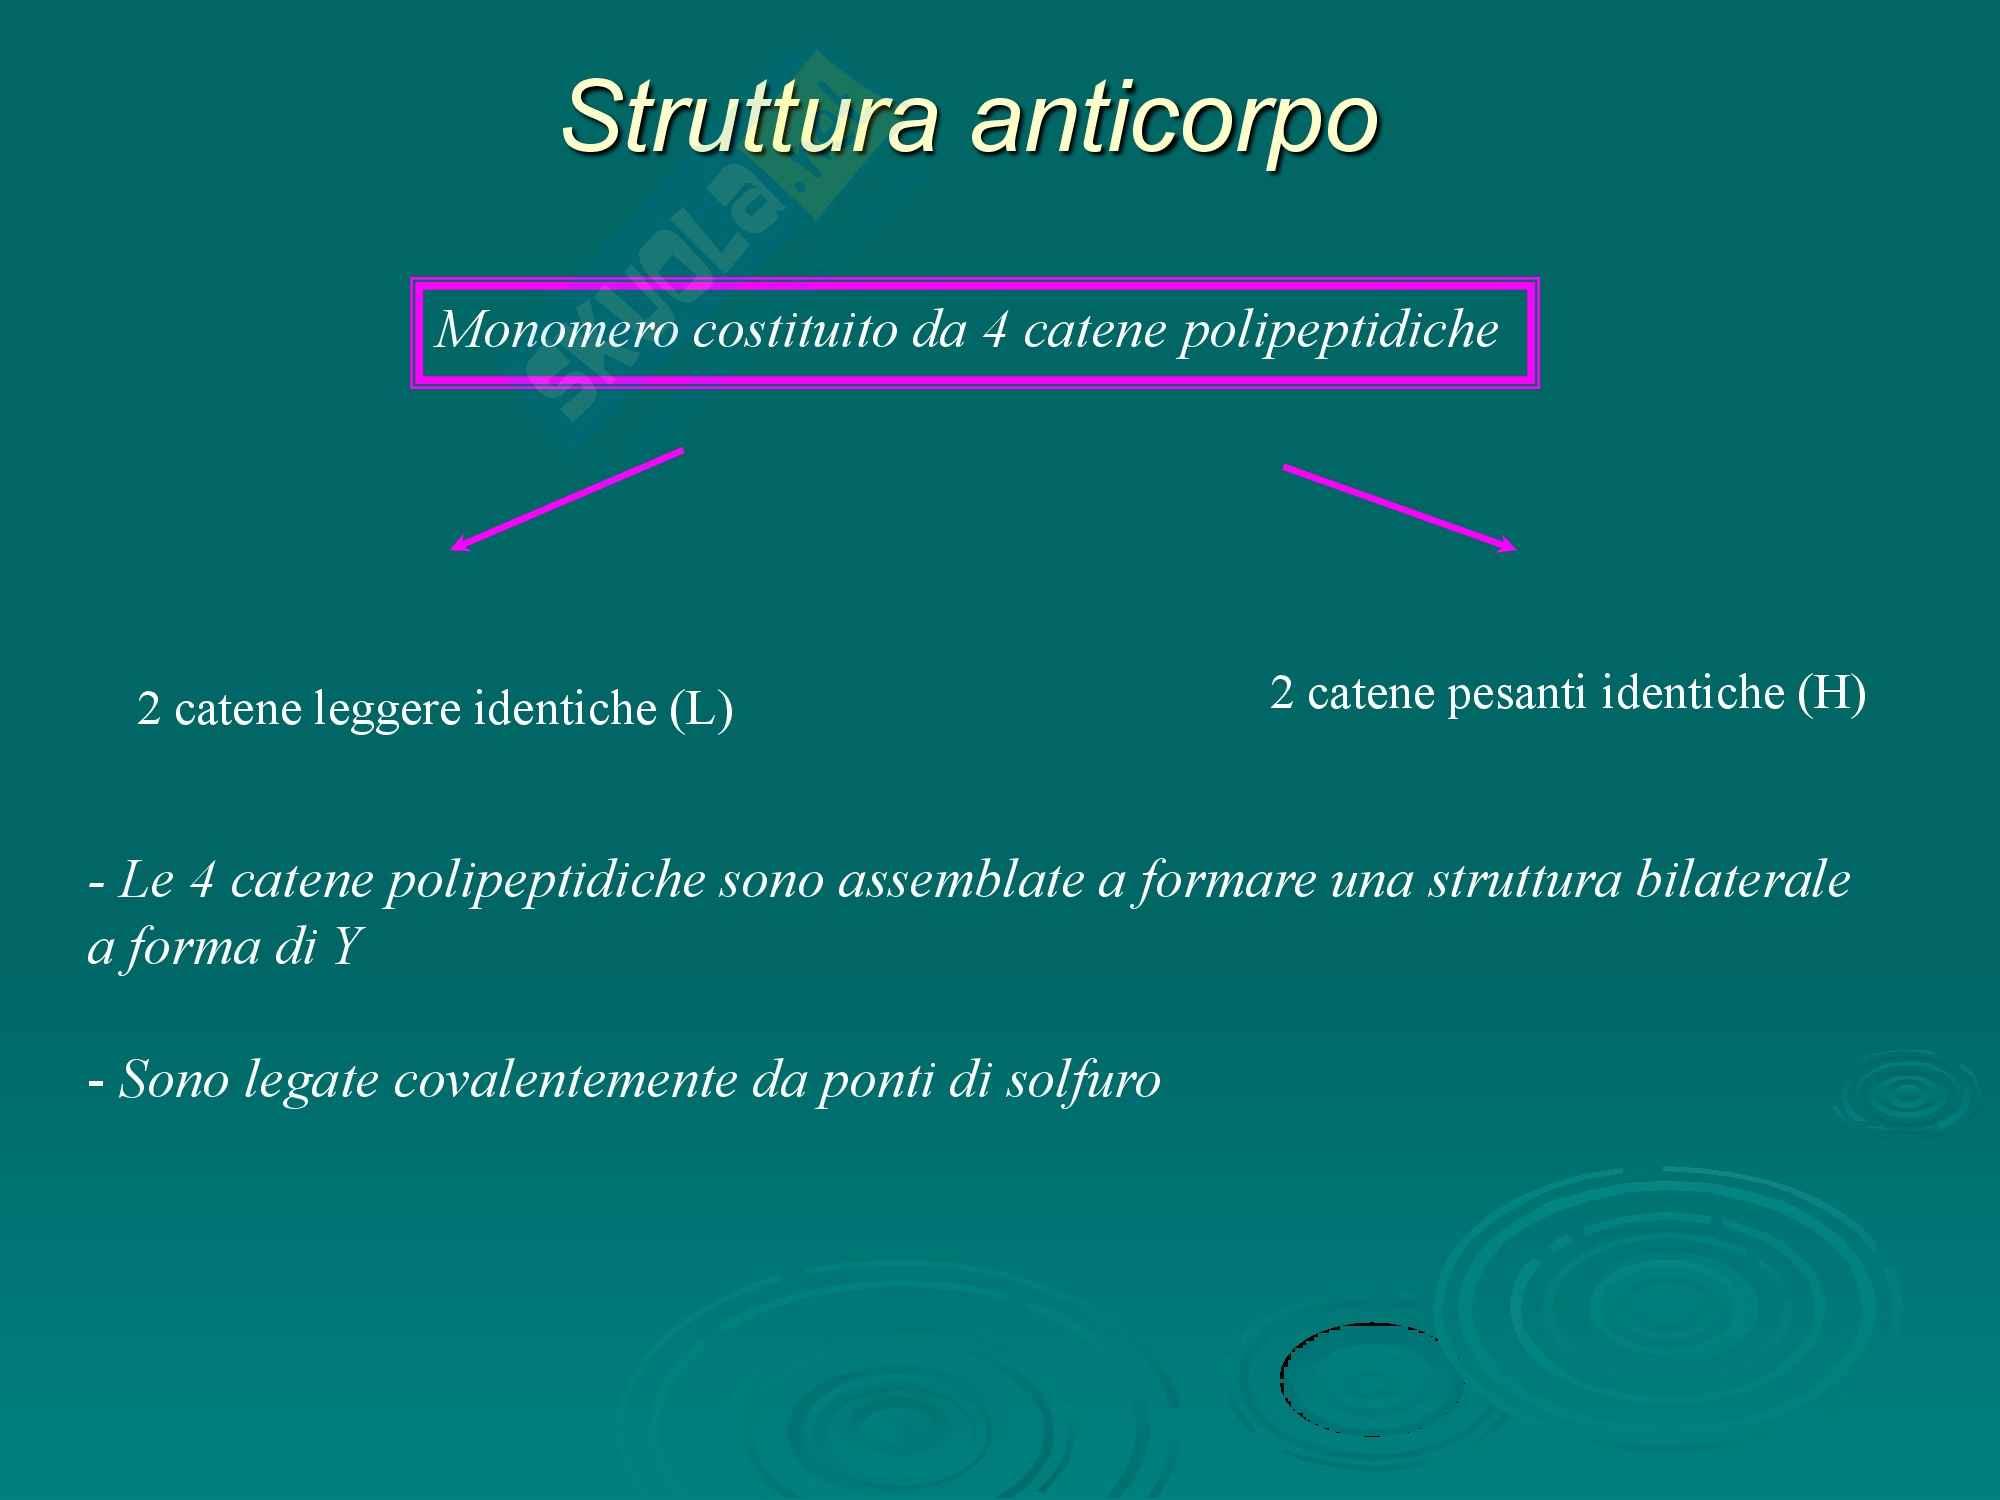 Sangue - I linfociti Pag. 6